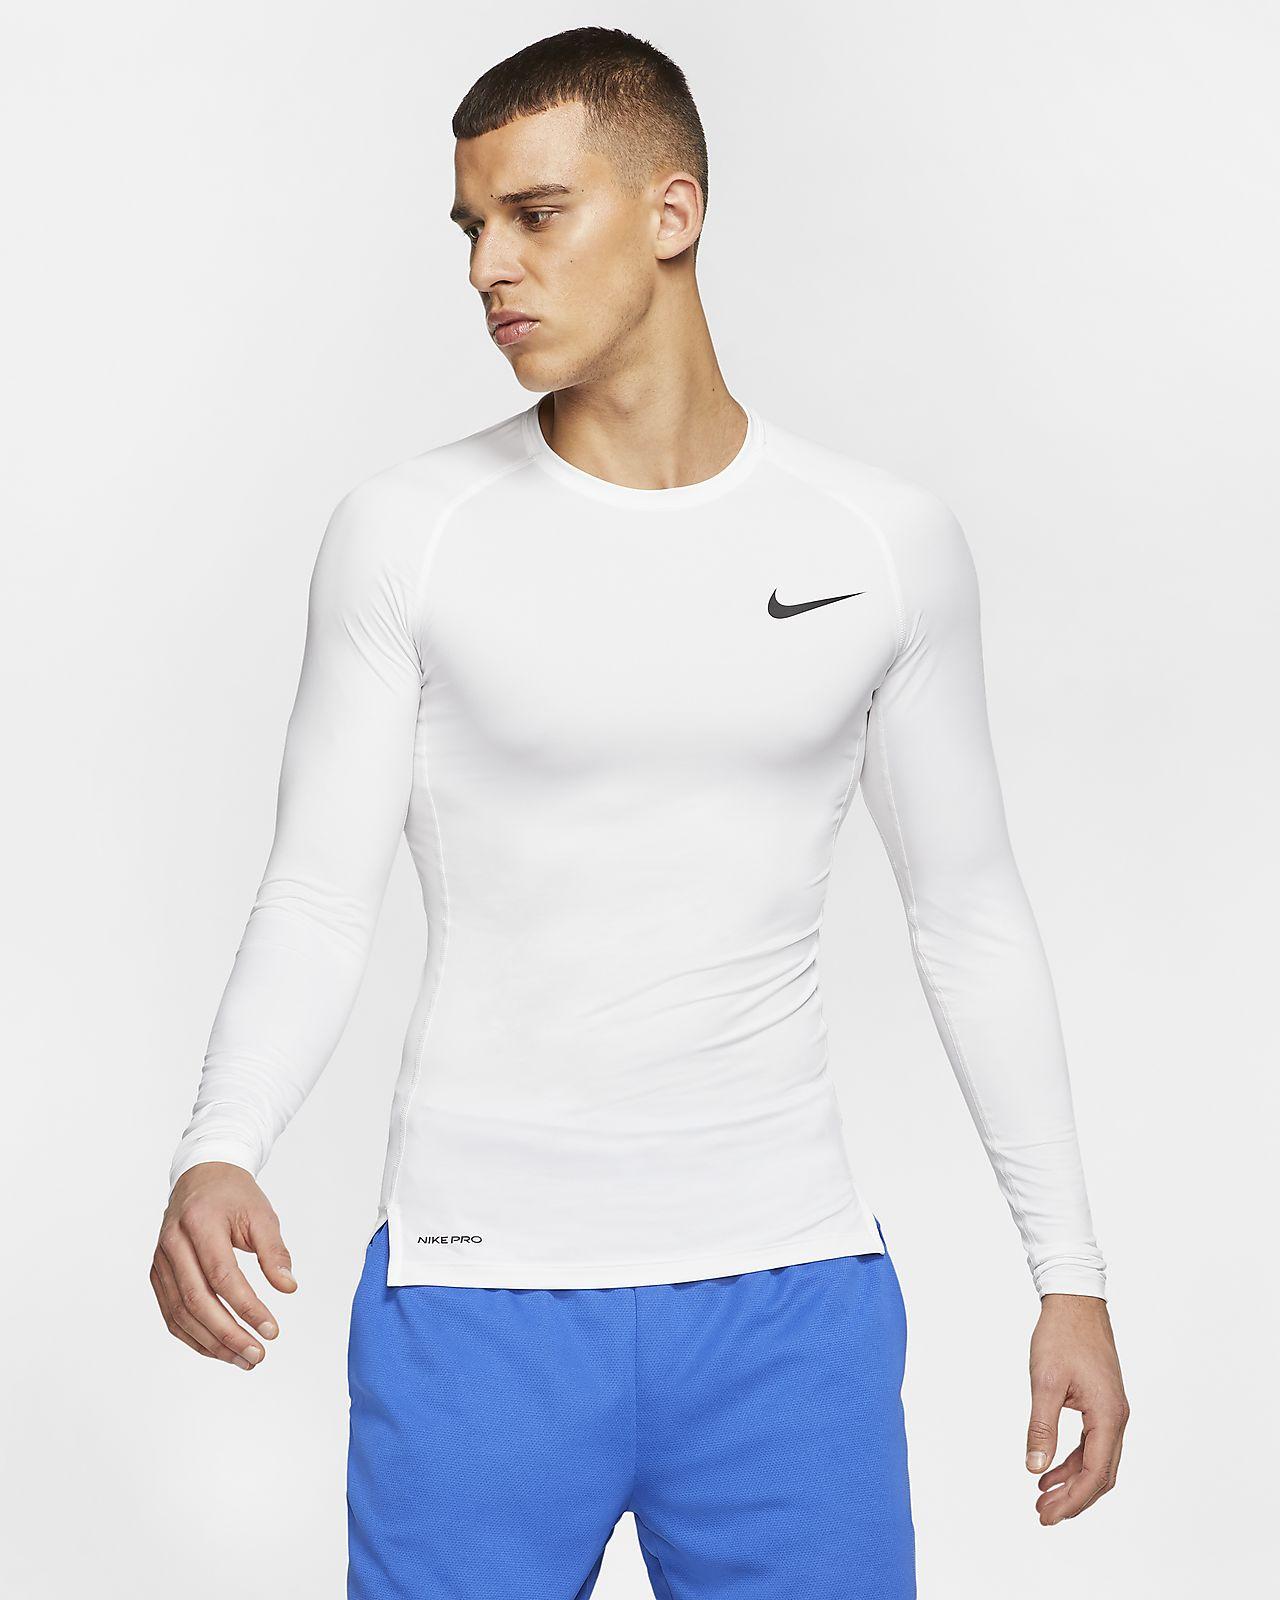 Maglia a manica lunga Tight Fit Nike Pro - Uomo